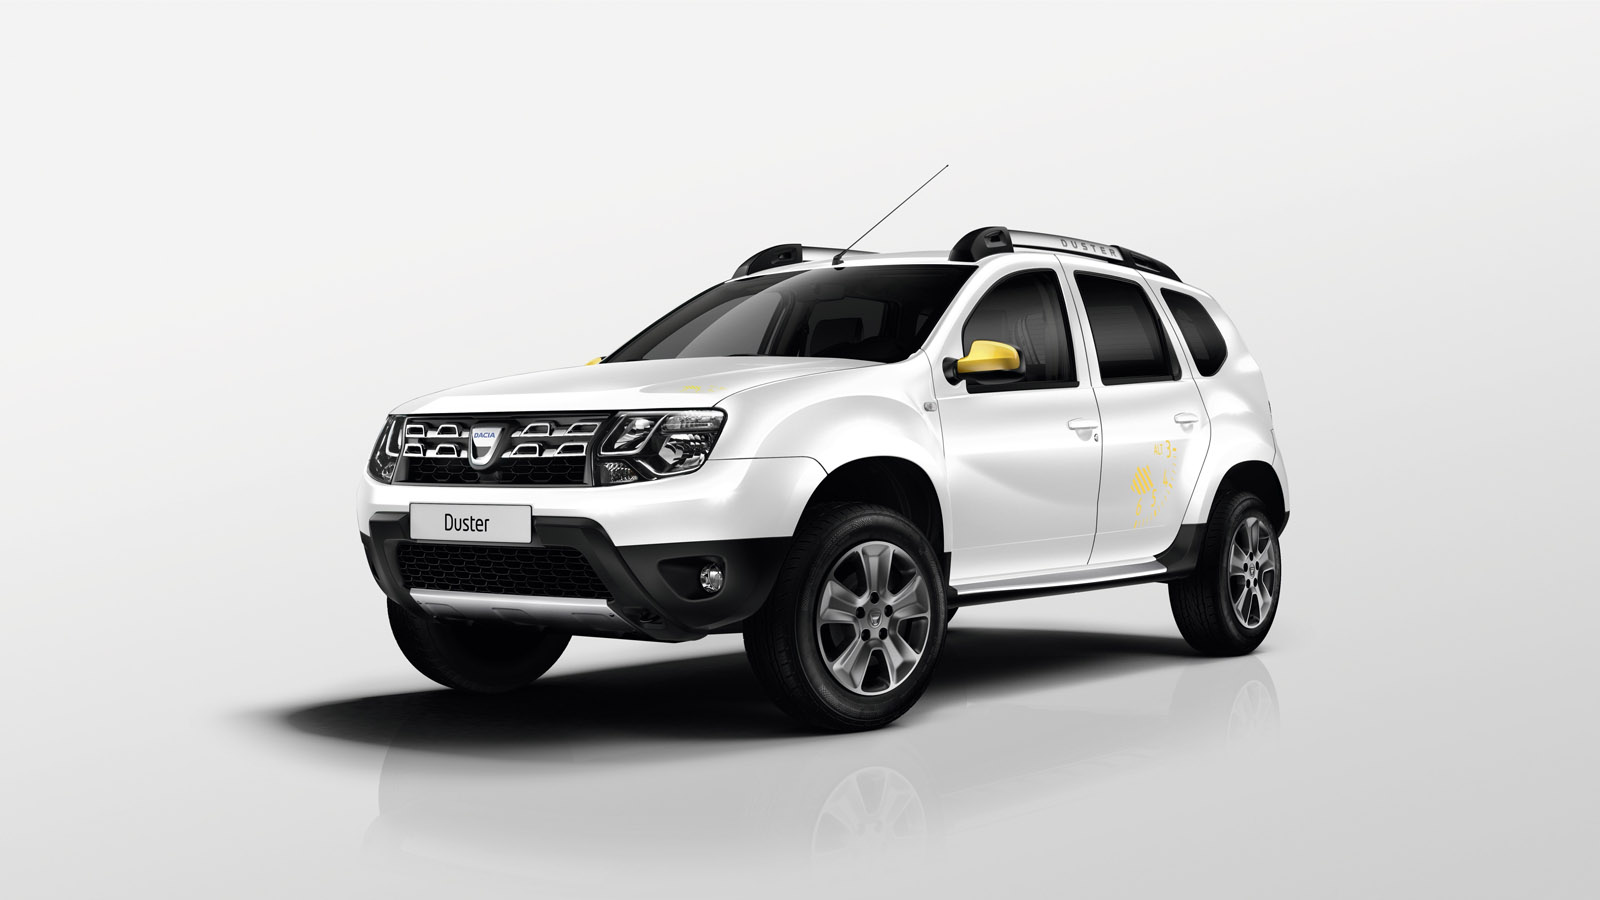 Yeni dacia duster air ve sandero black touch paris 39 te for Dacia duster interni 2014